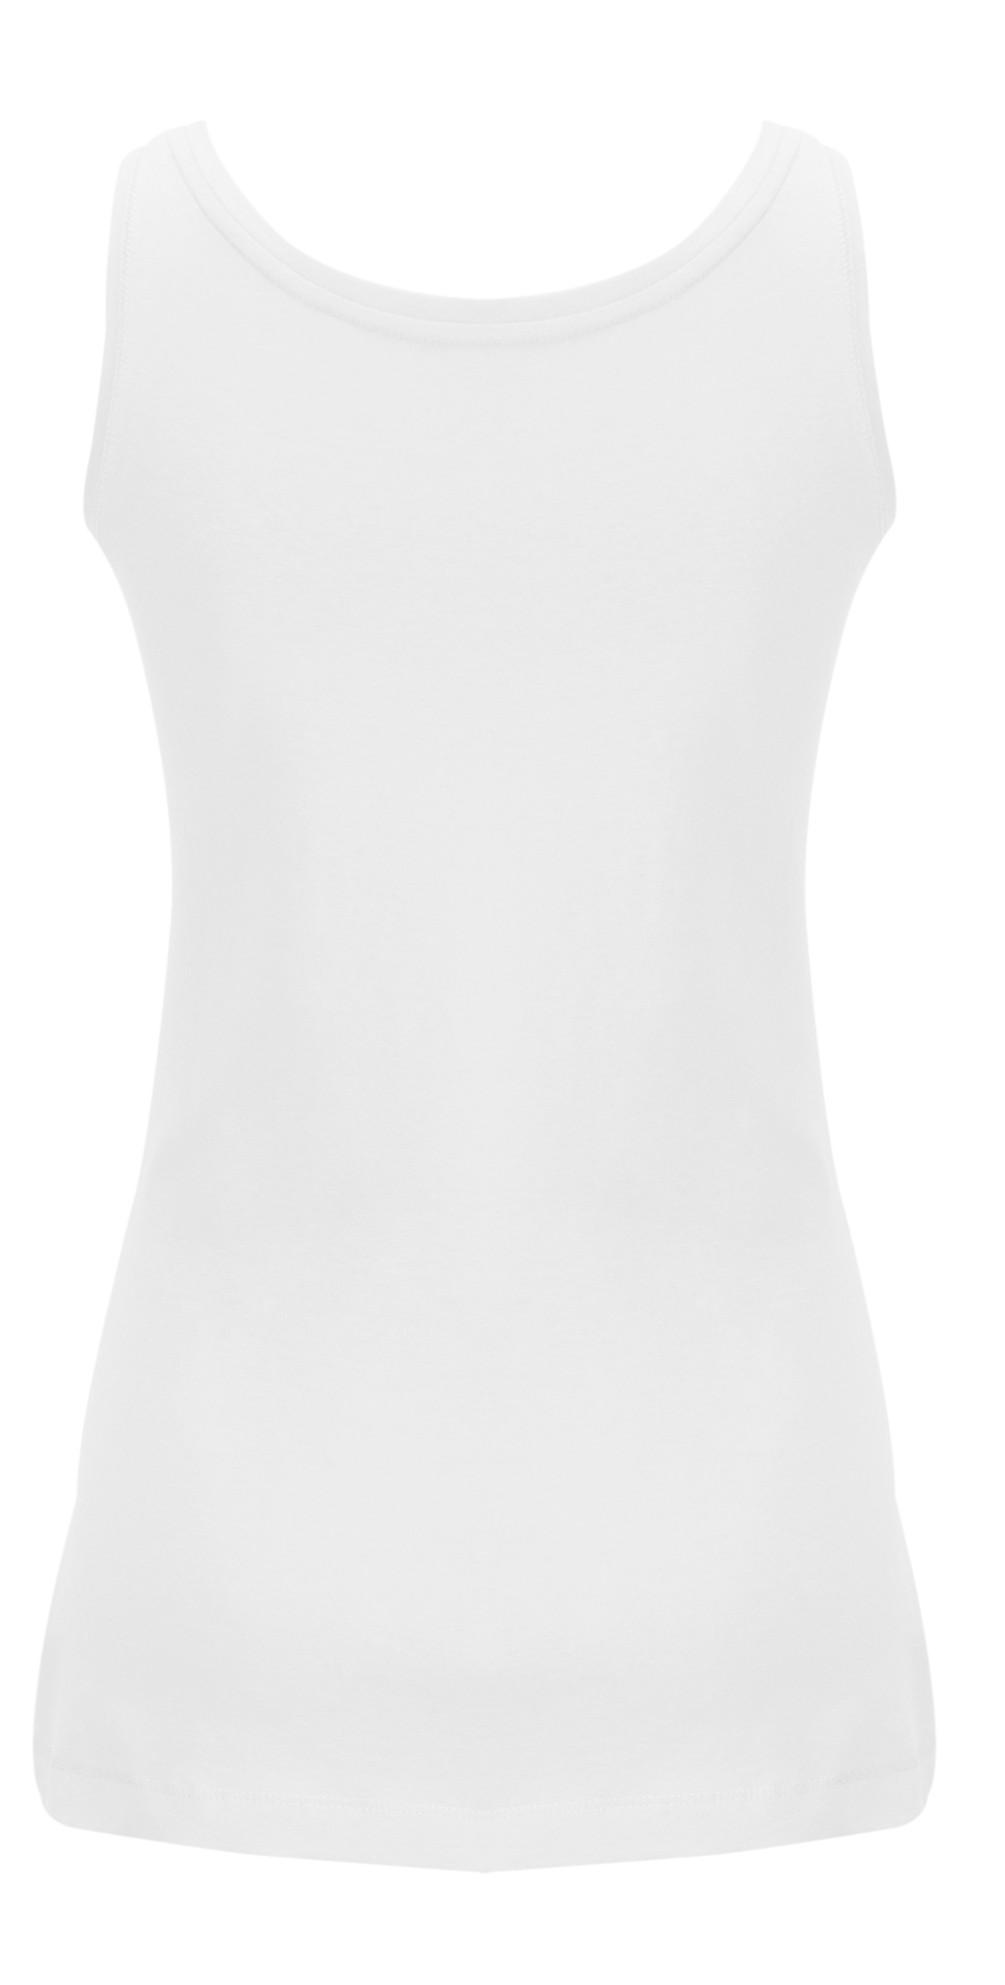 Essentials Light Cotton Singlet main image